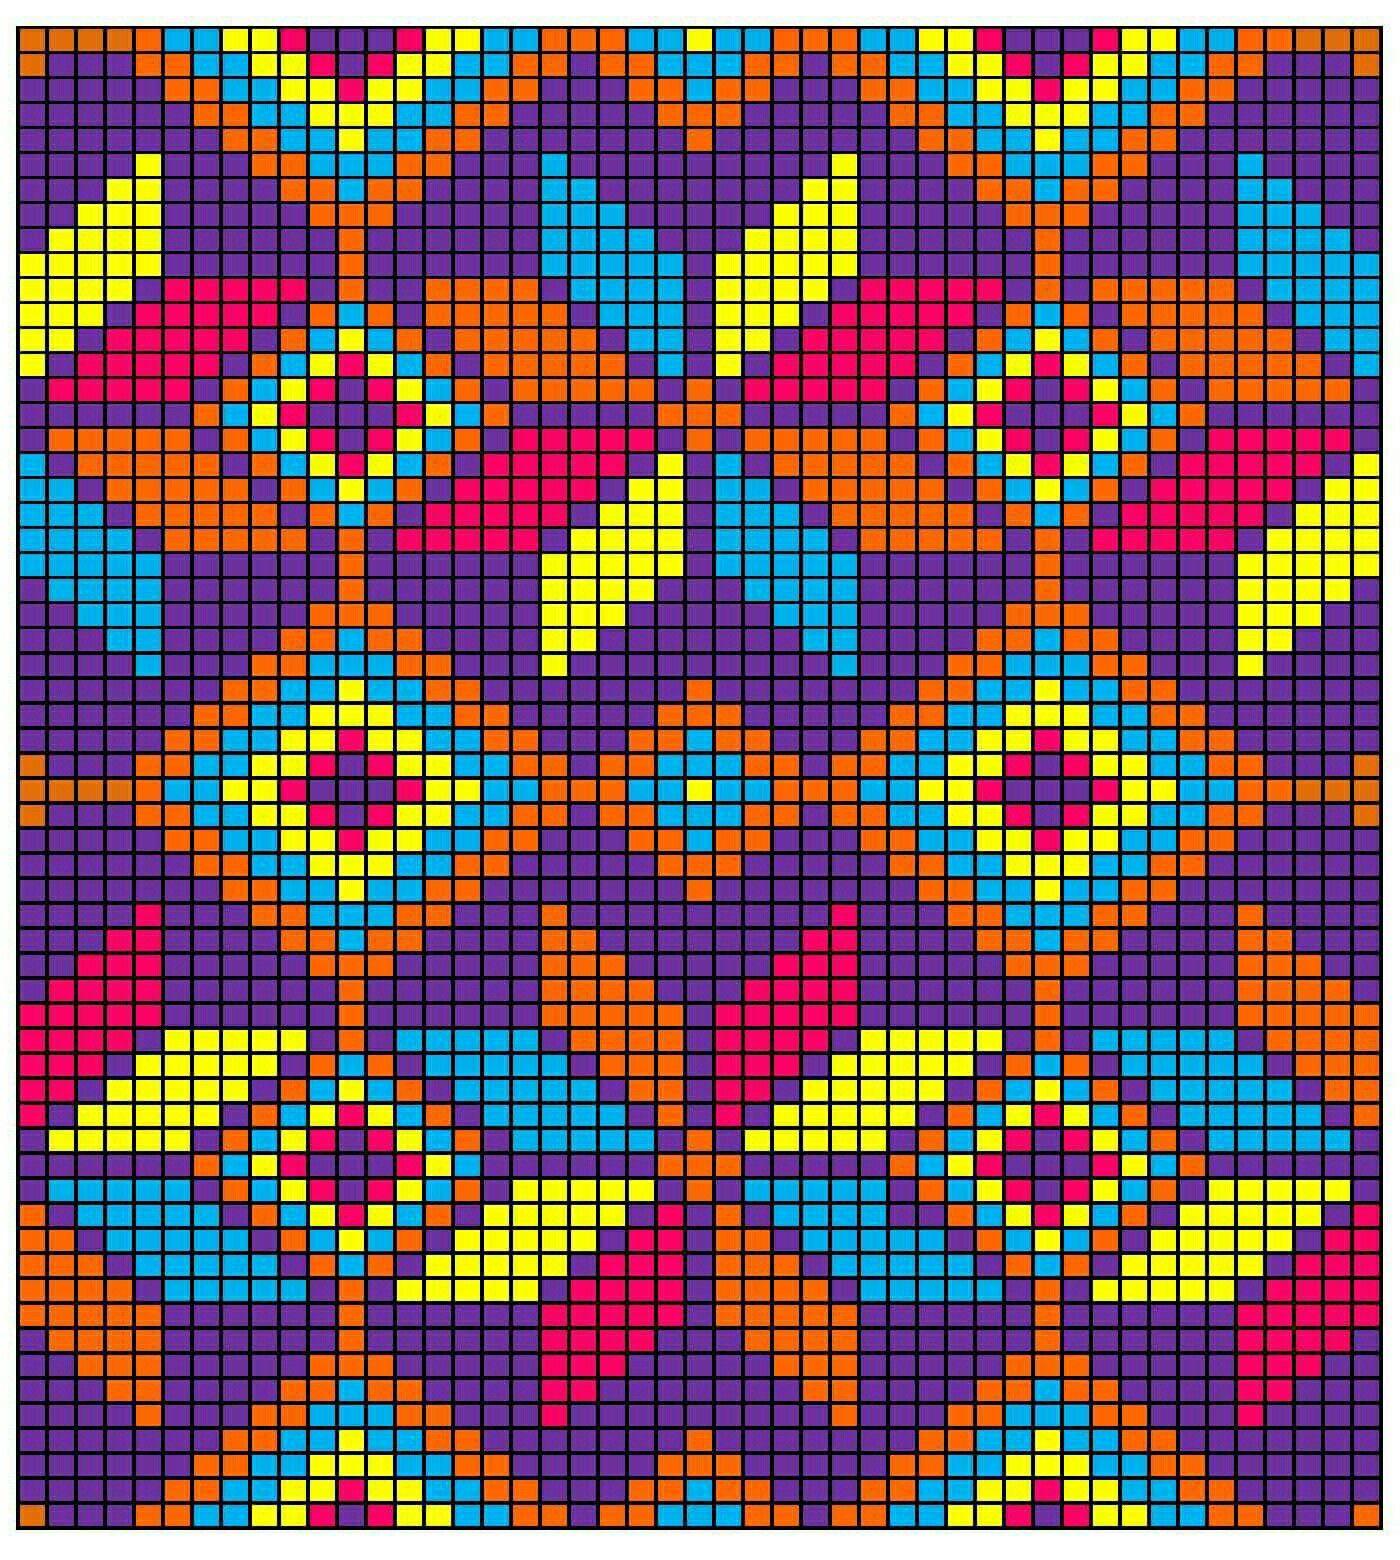 Pin von Janeth auf mochila wayyu | Pinterest | Strickmuster ...